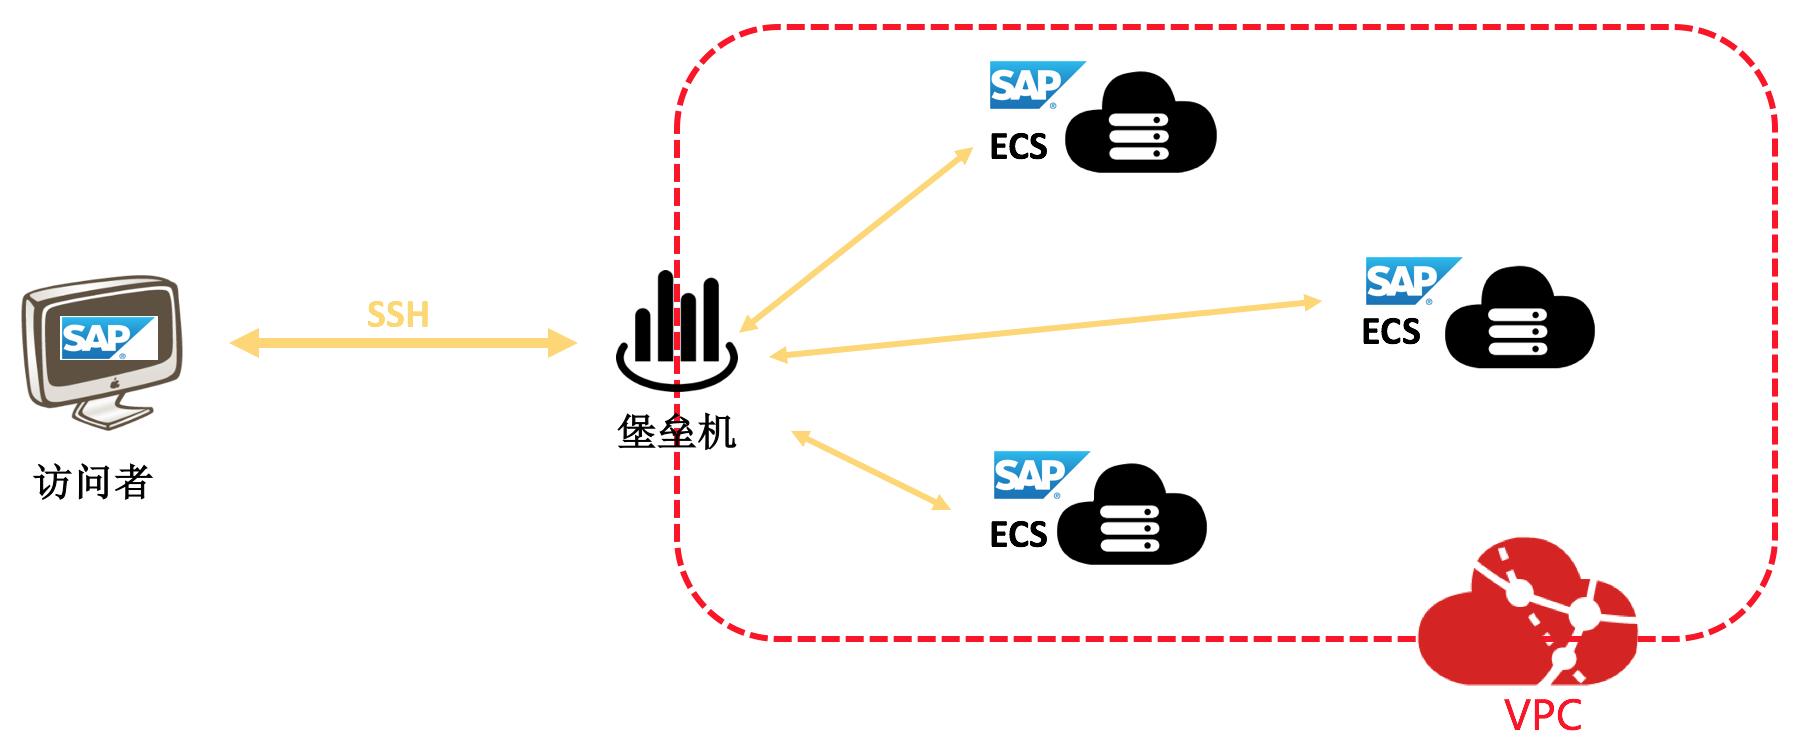 sap-netweaver-planning-bastion